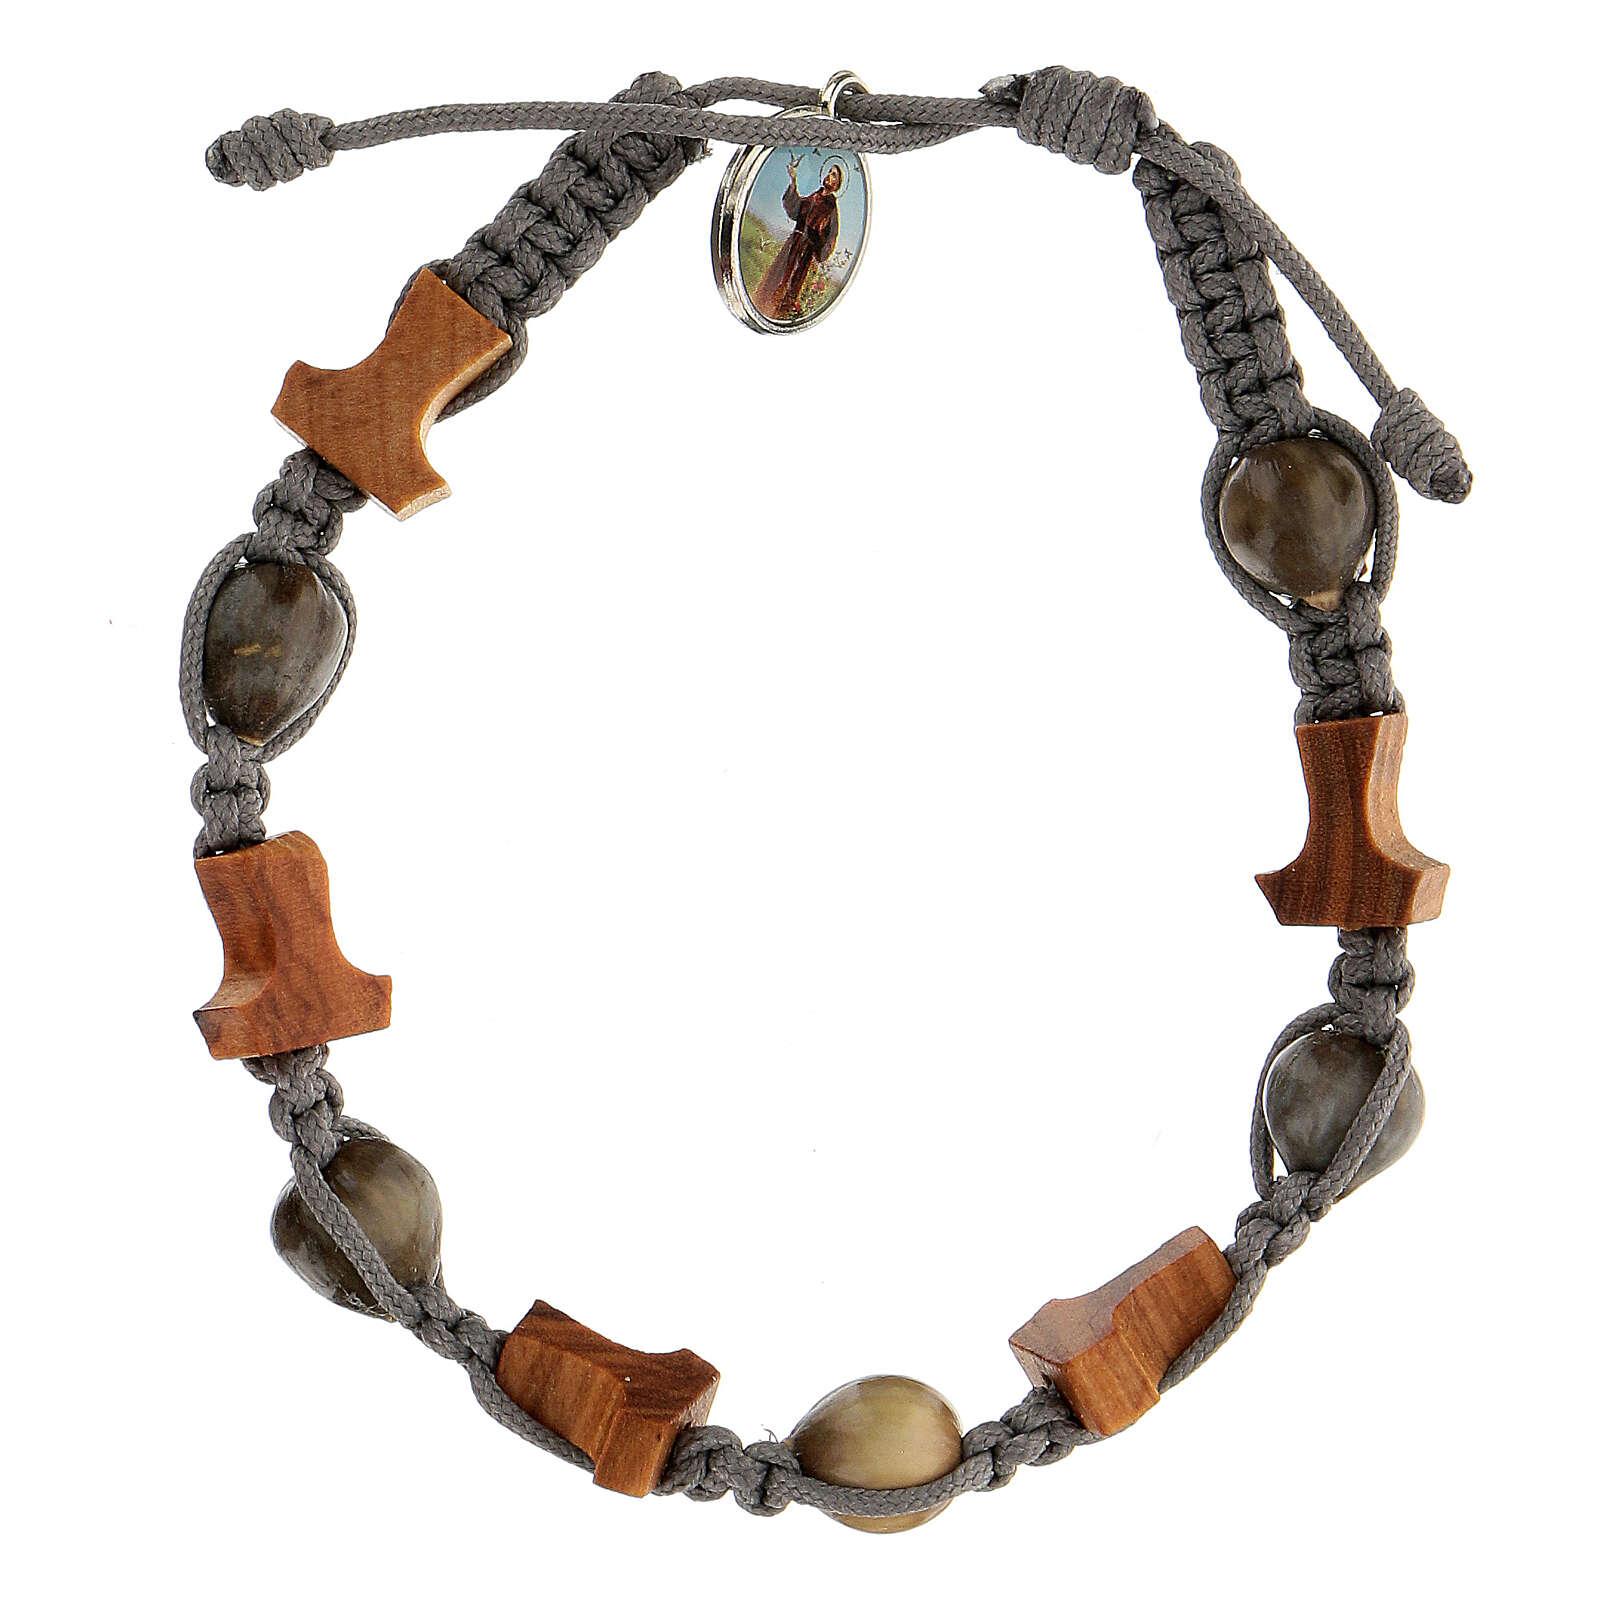 Bracelet grains ronds croix tau Medjugorje corde grise Larmes-de-Job 4